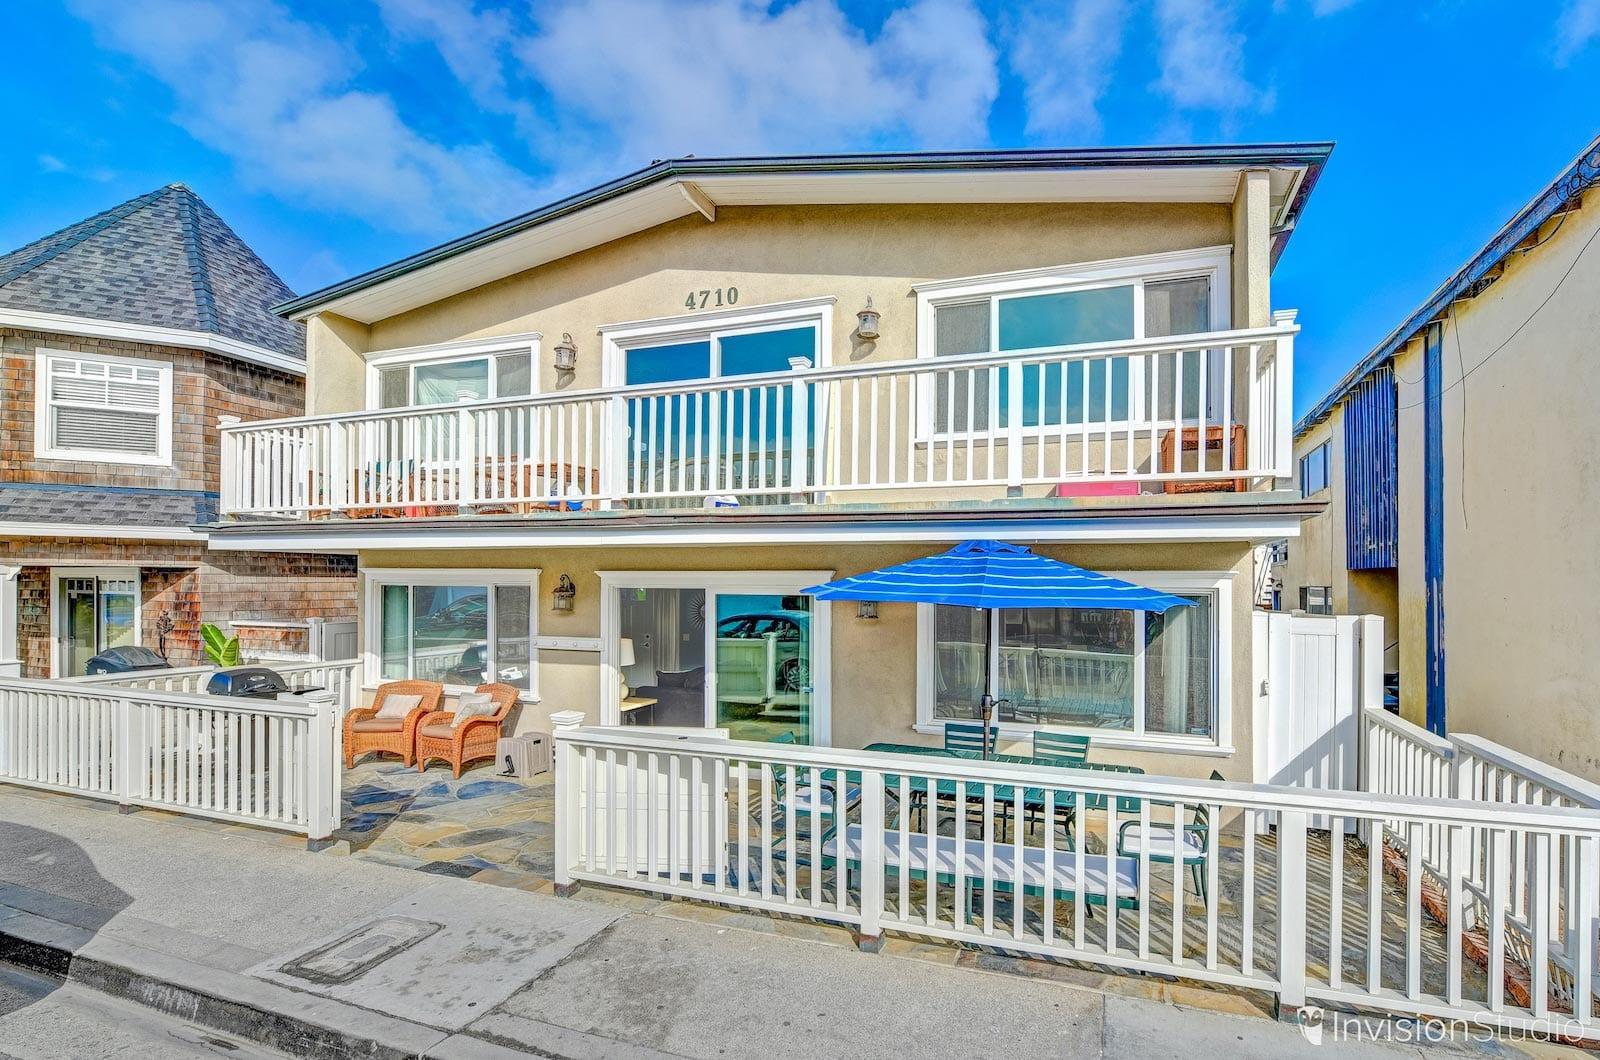 Long Beach Virtual Tour Photographer   Long Beach Aerial Photography Services   Long Beach HDR Real Estate Photography Services   Long Beach Matterport 3D Tours